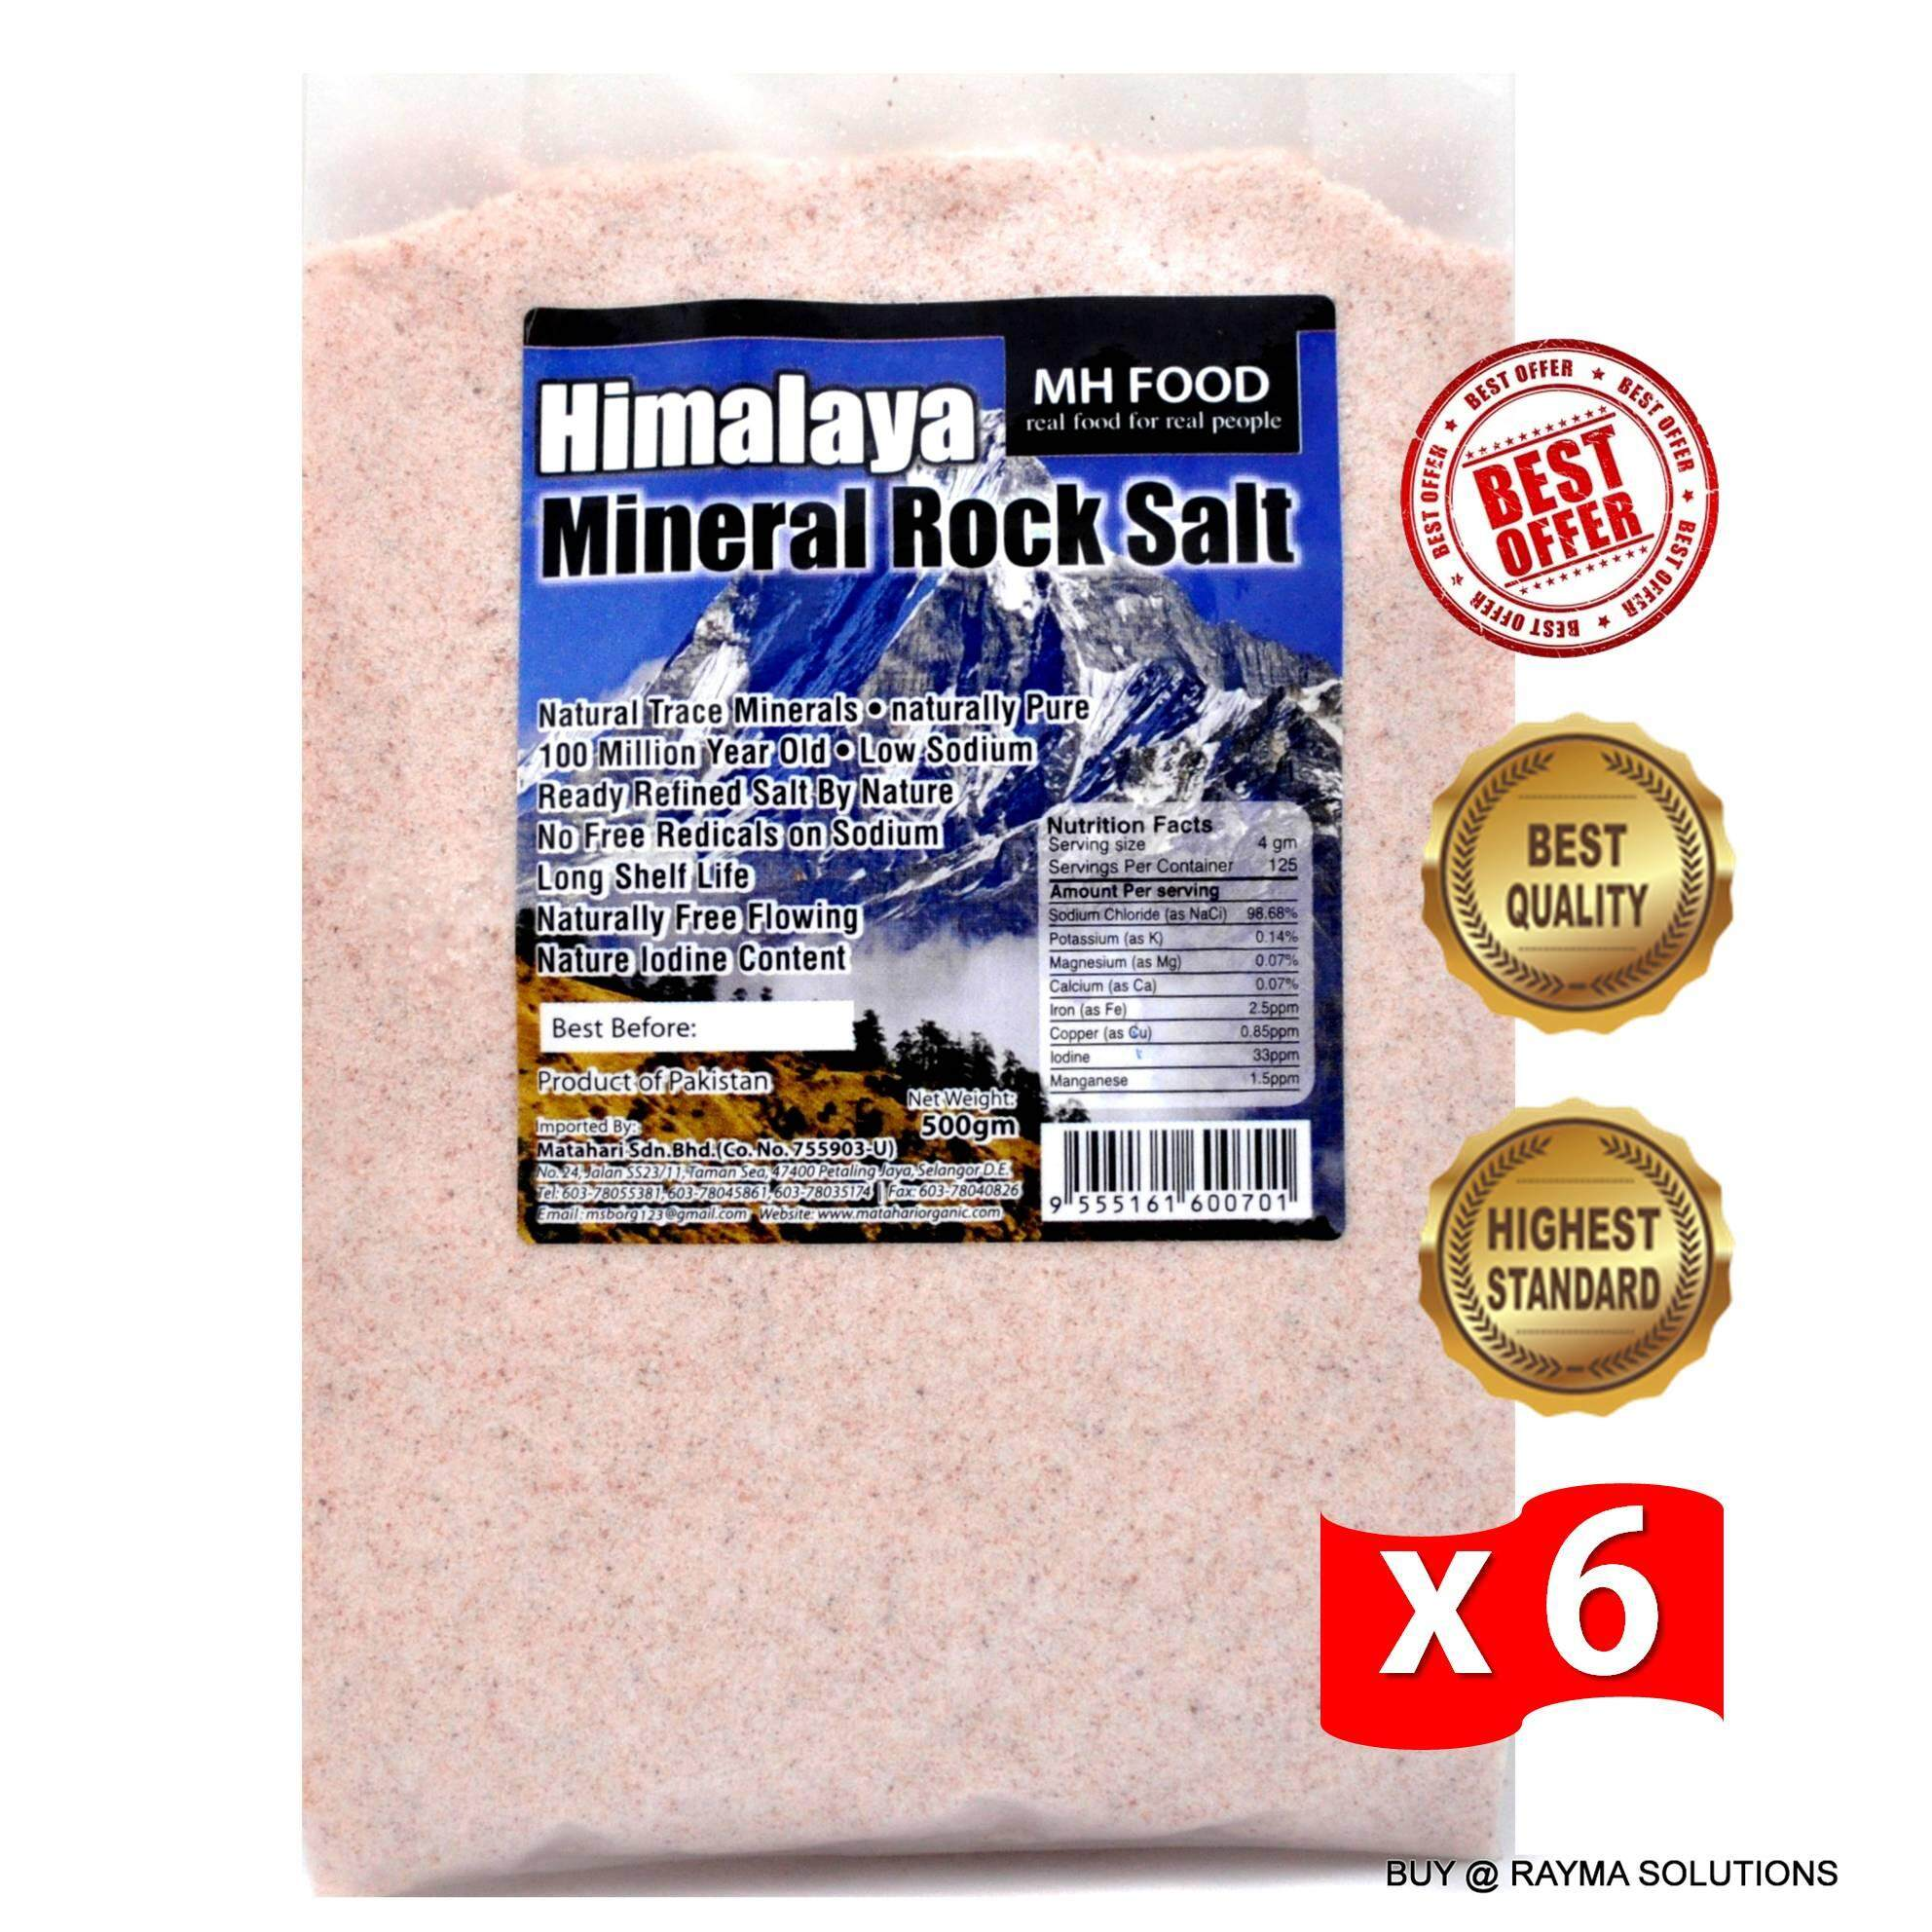 BEST DEAL MH FOOD Premium Himalaya Mineral Rock Salt, Fine, 500g (6 Packs)